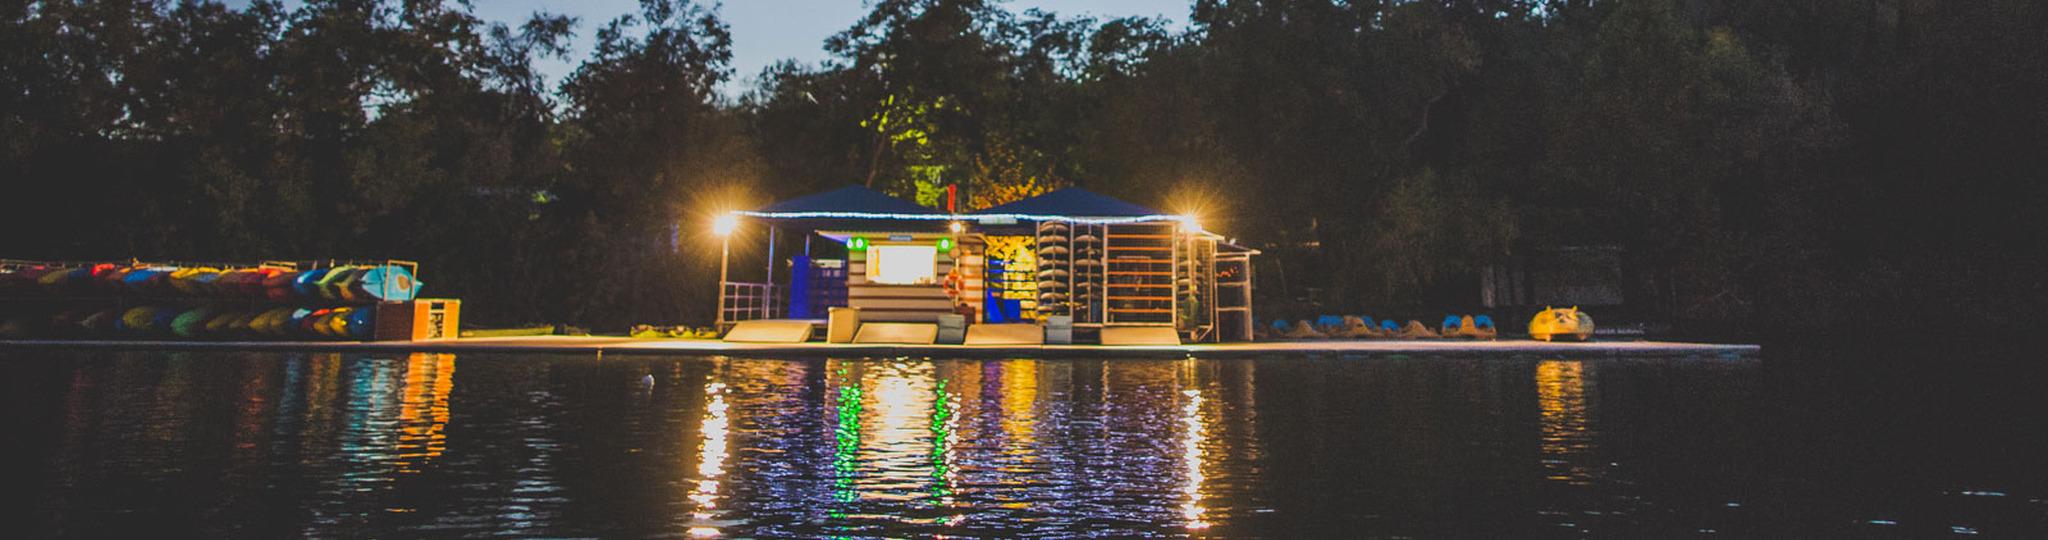 Rowing dock